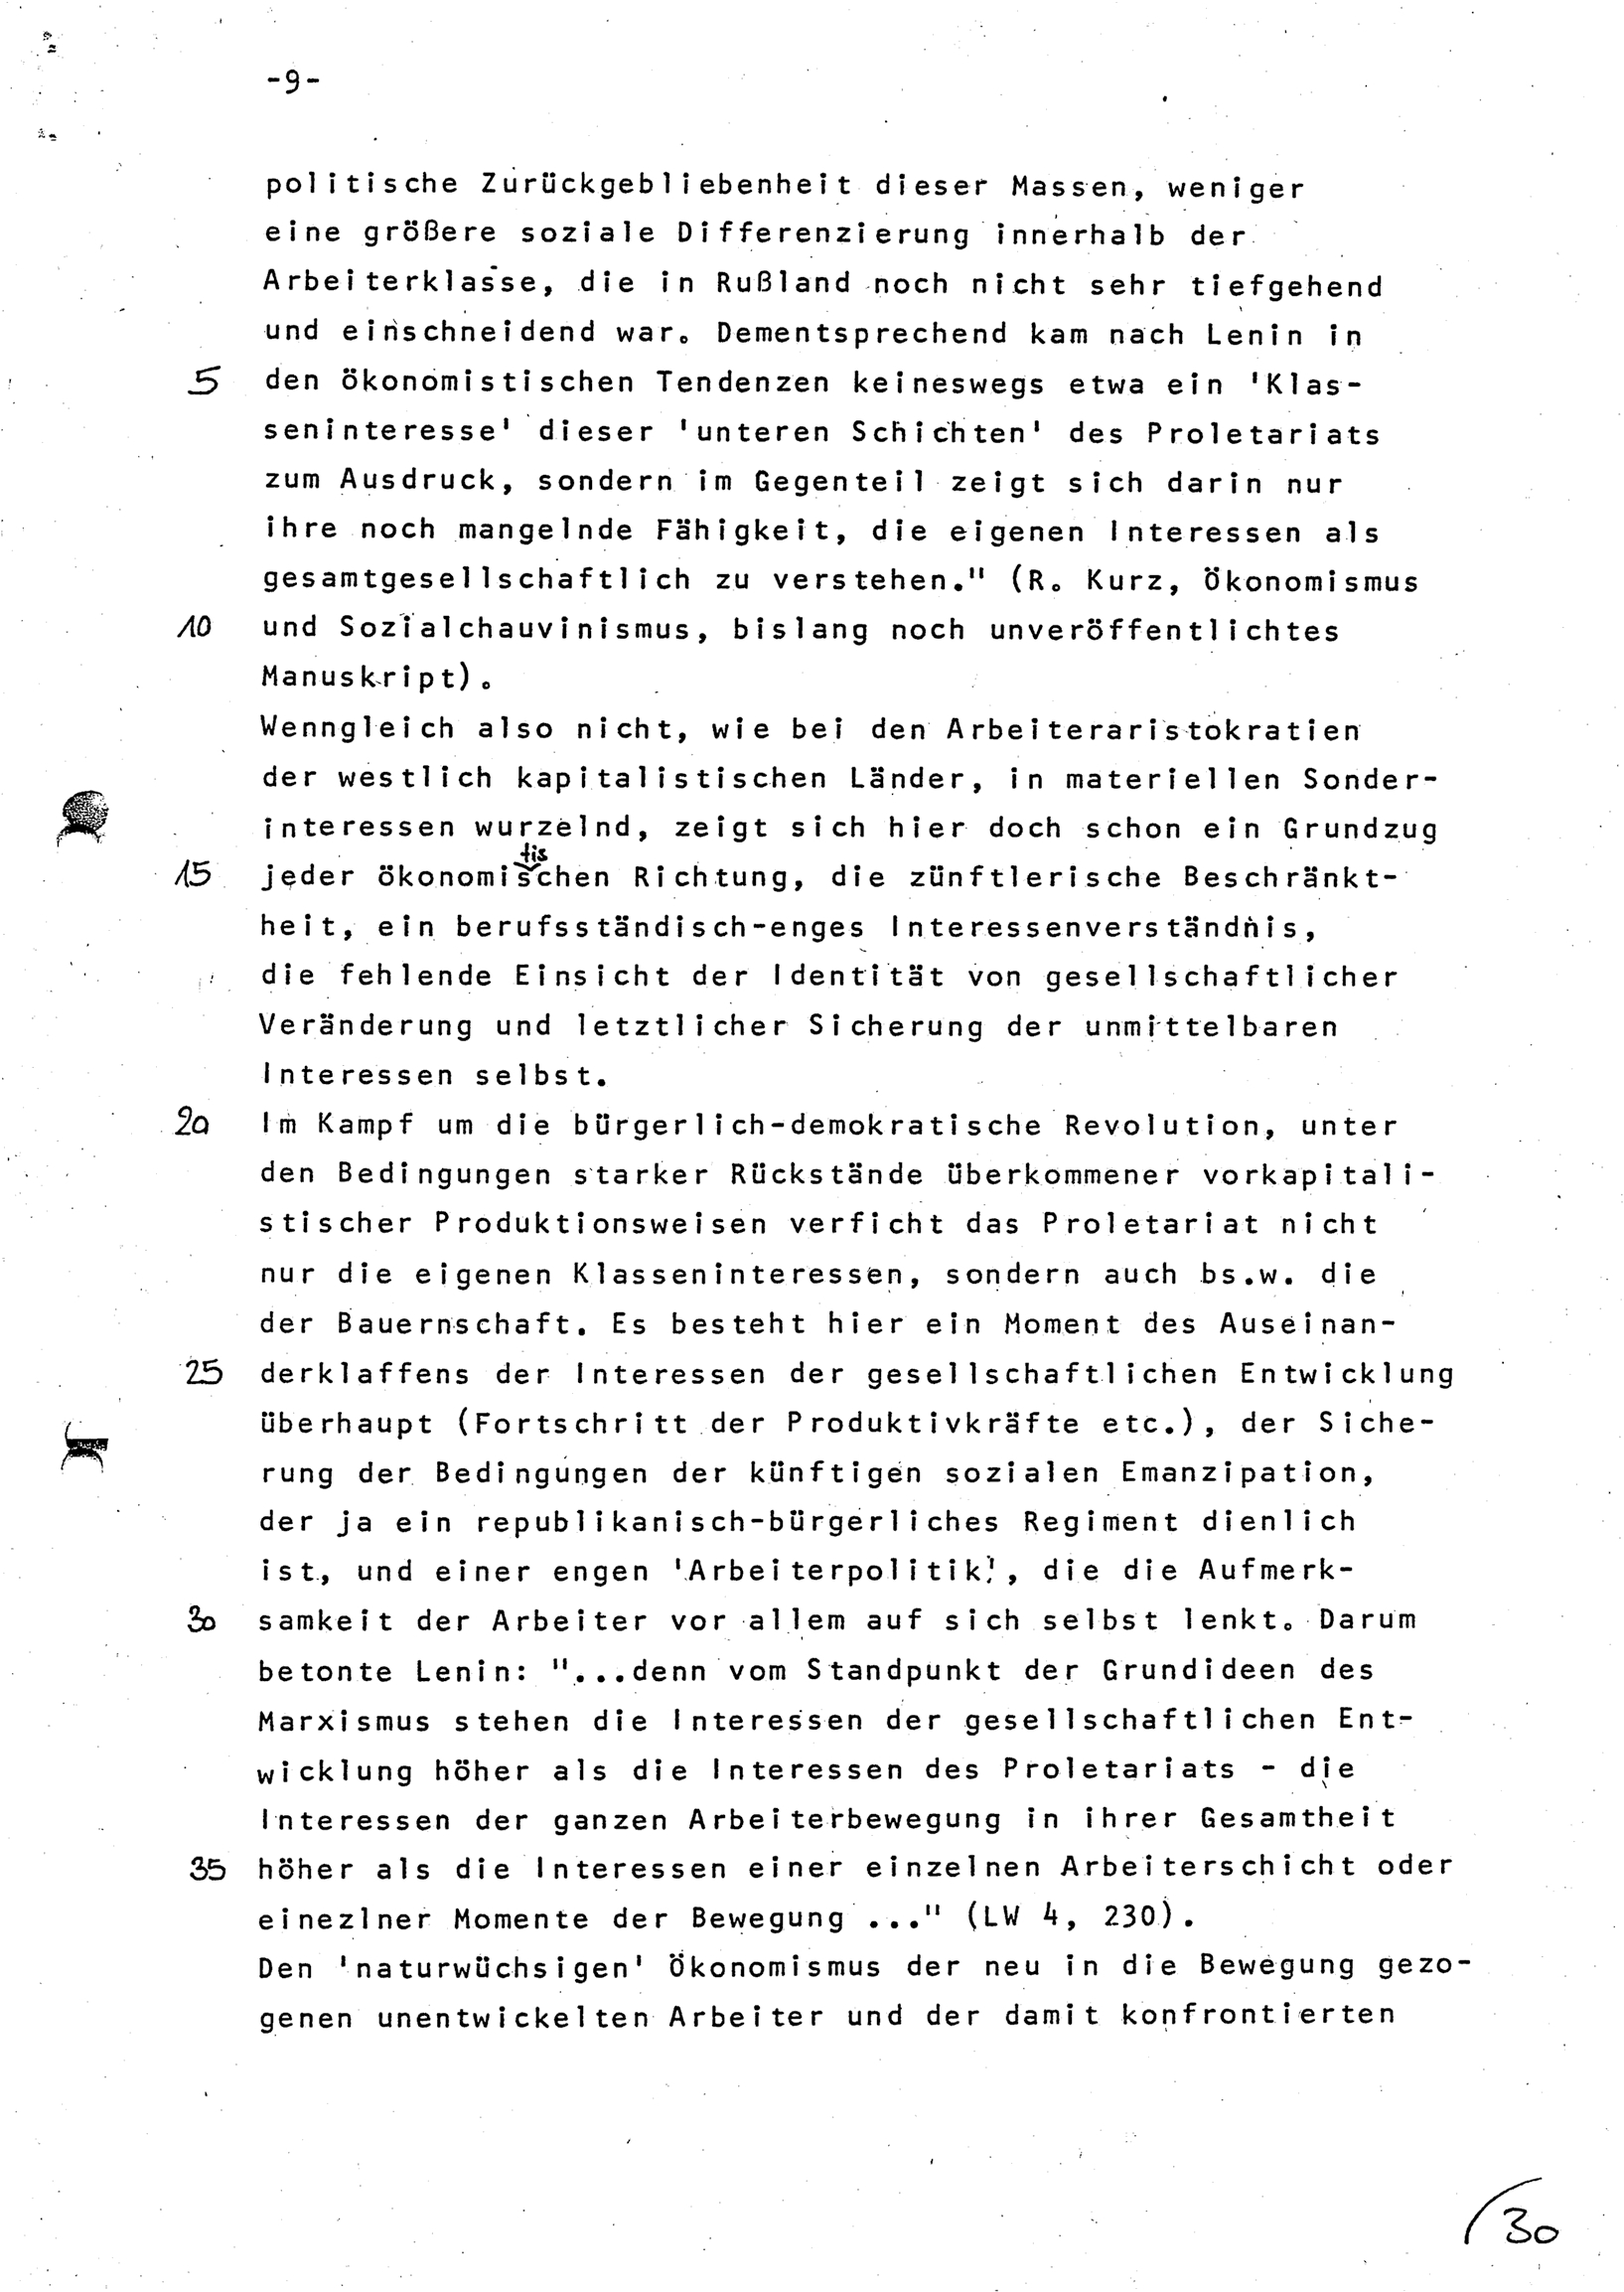 Ulm_KGU_Arbeitsheft_19830425_015_033